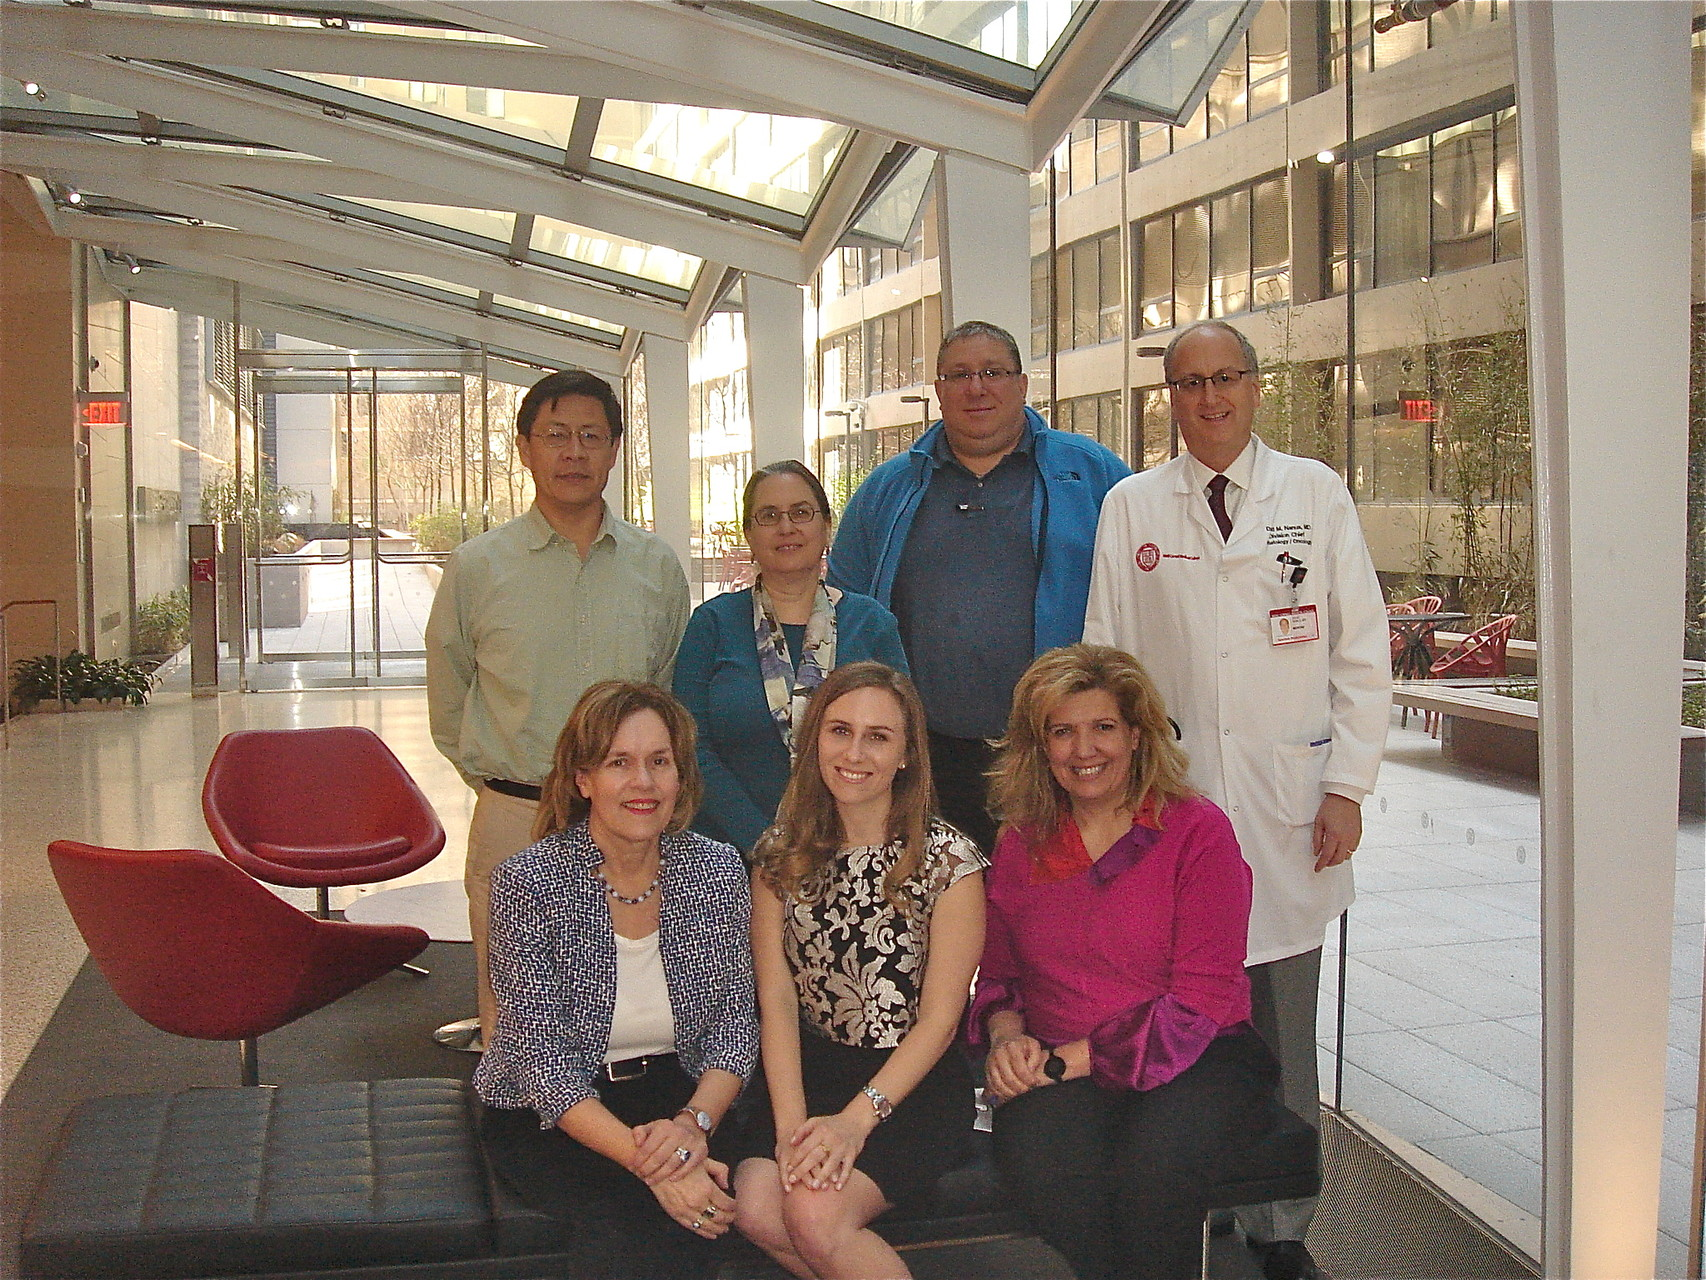 Denise Minton defends her thesis research, May, 2015,  Lorraine Gudas, Denise Minton, Evi Giannakakou (front); Yueming Li, Terry Milner, Lonny Levin, David Nanus (back)